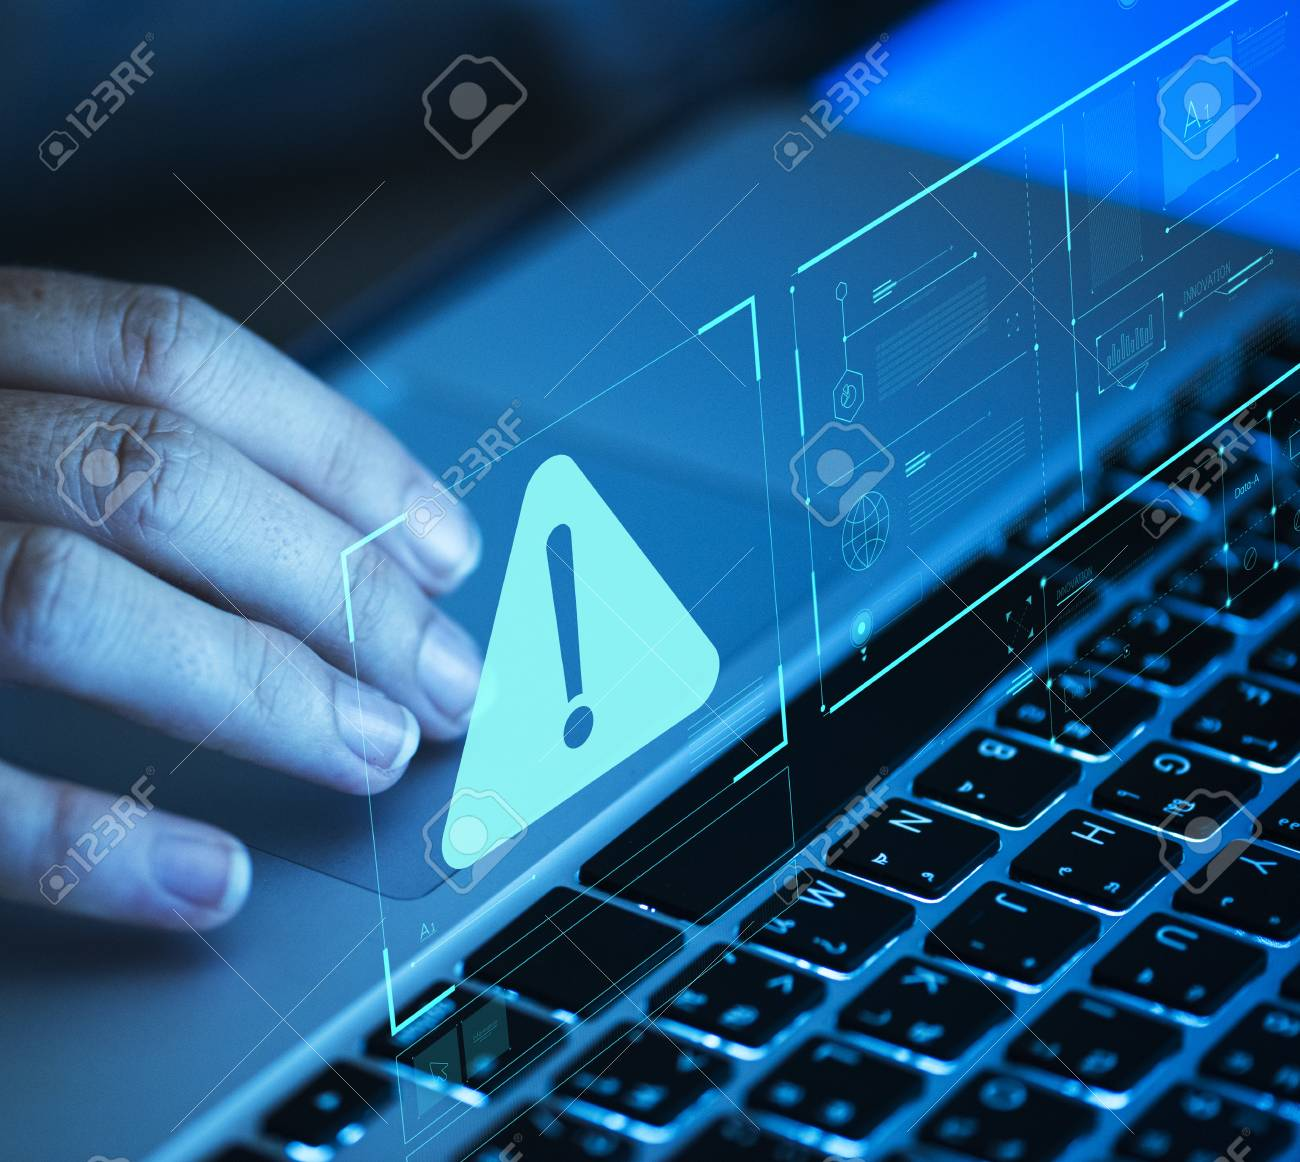 Woman scrolling on a laptop - 110449727